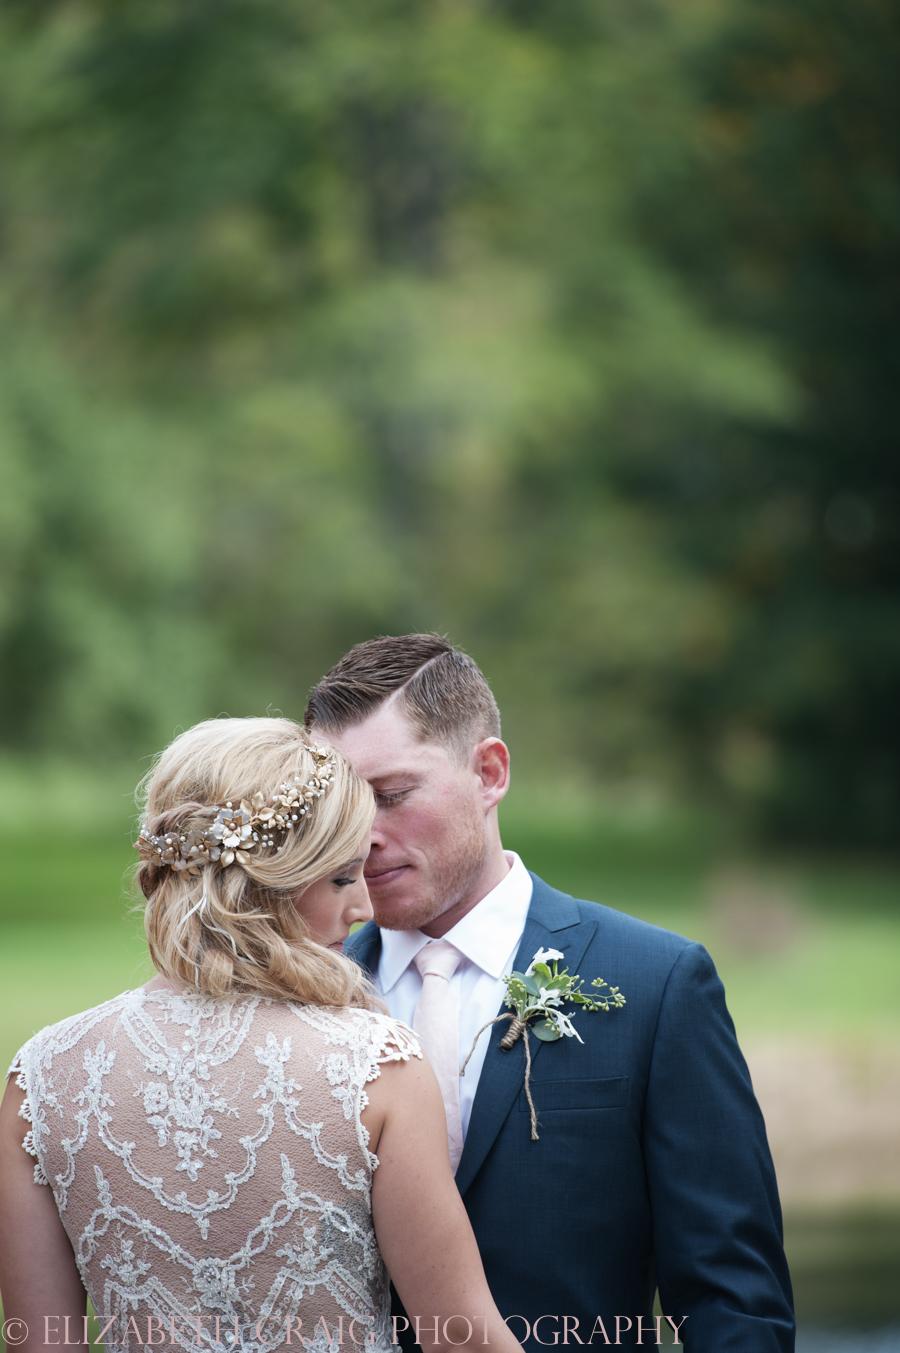 Dubois Brockway St. Marys PA Weddings-0115